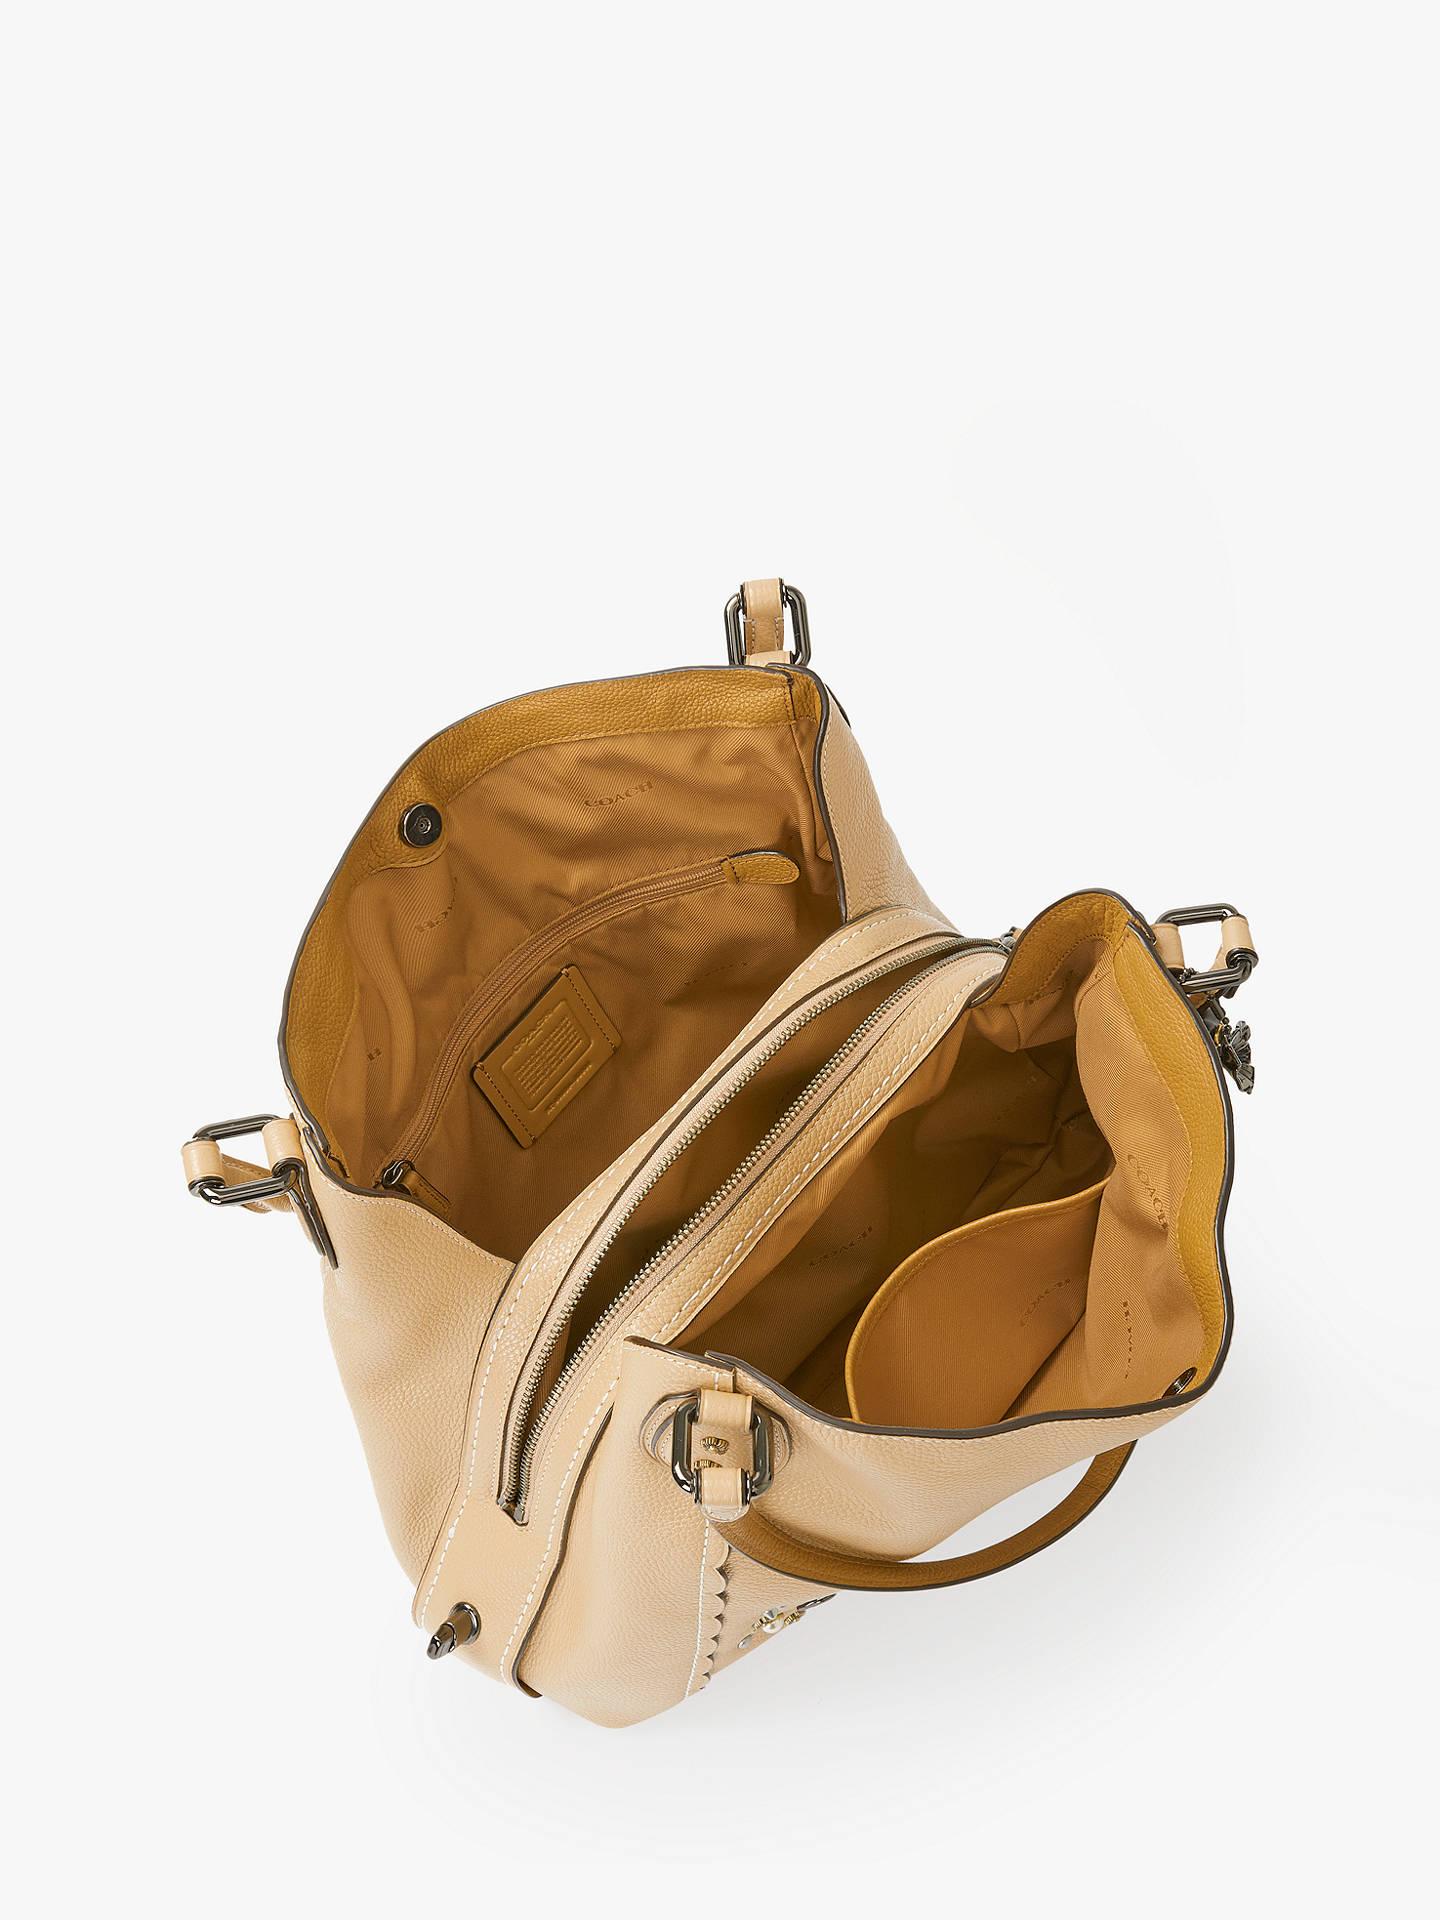 567fdd8f6fab Coach Edie 31 Polished Pebble Leather Shoulder Bag at John Lewis ...